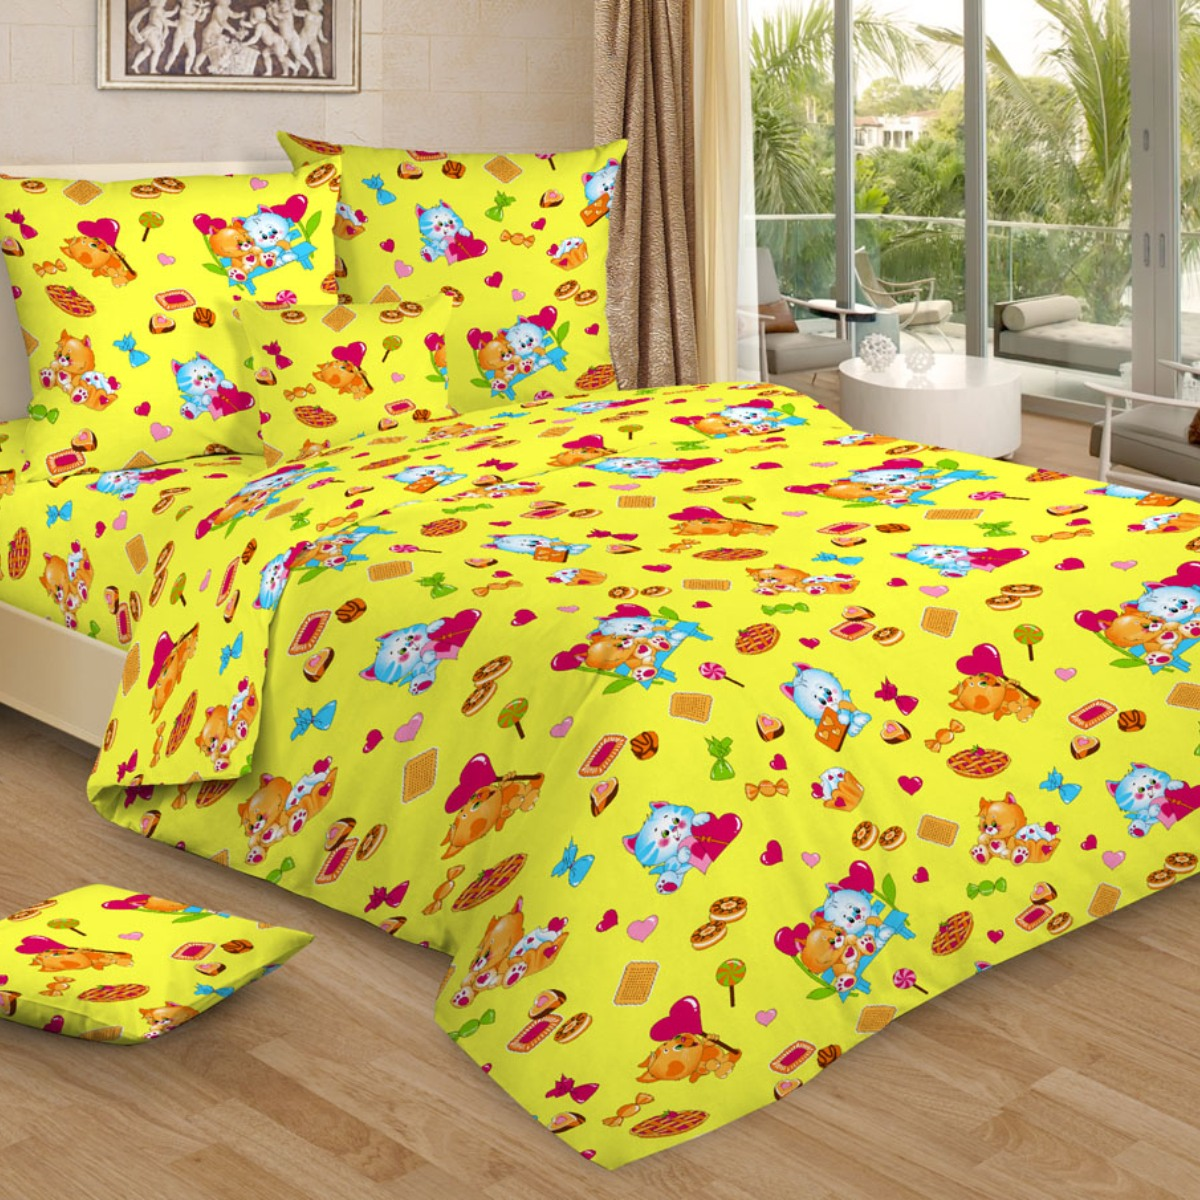 Letto Комплект в кроватку цвет желтый BG-93